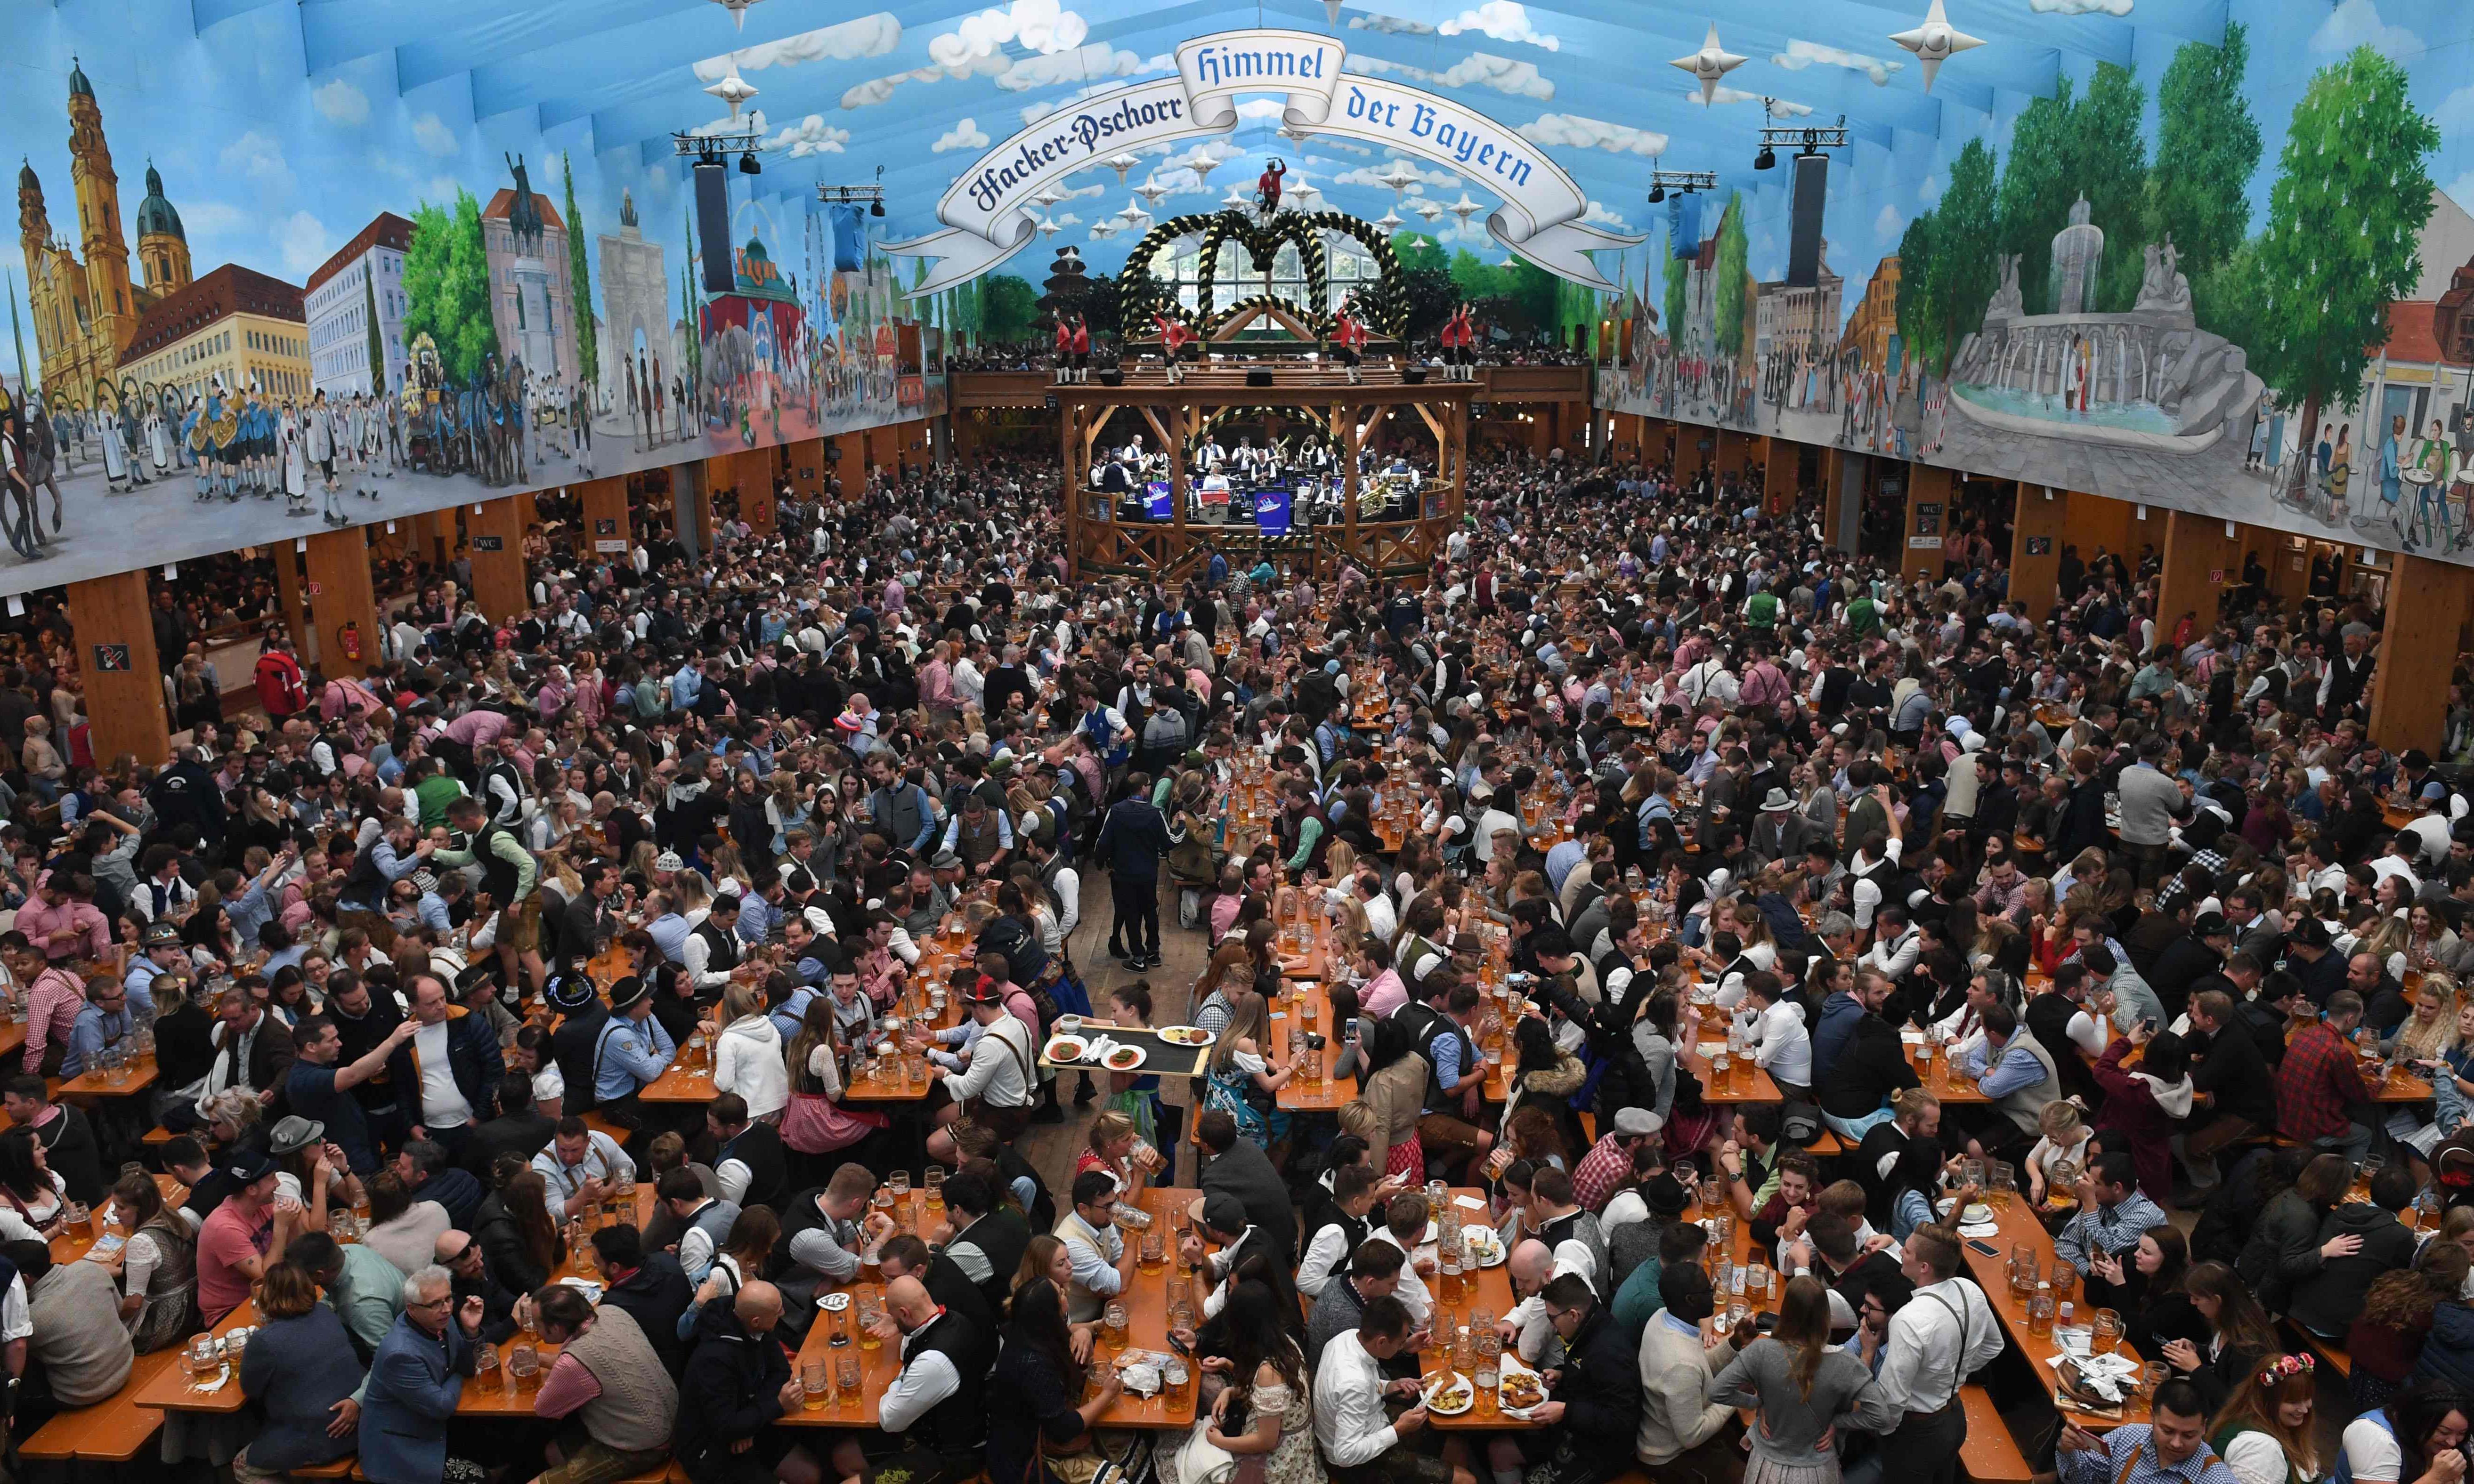 Oktoberfest 'produces 10 times as much methane as Boston'